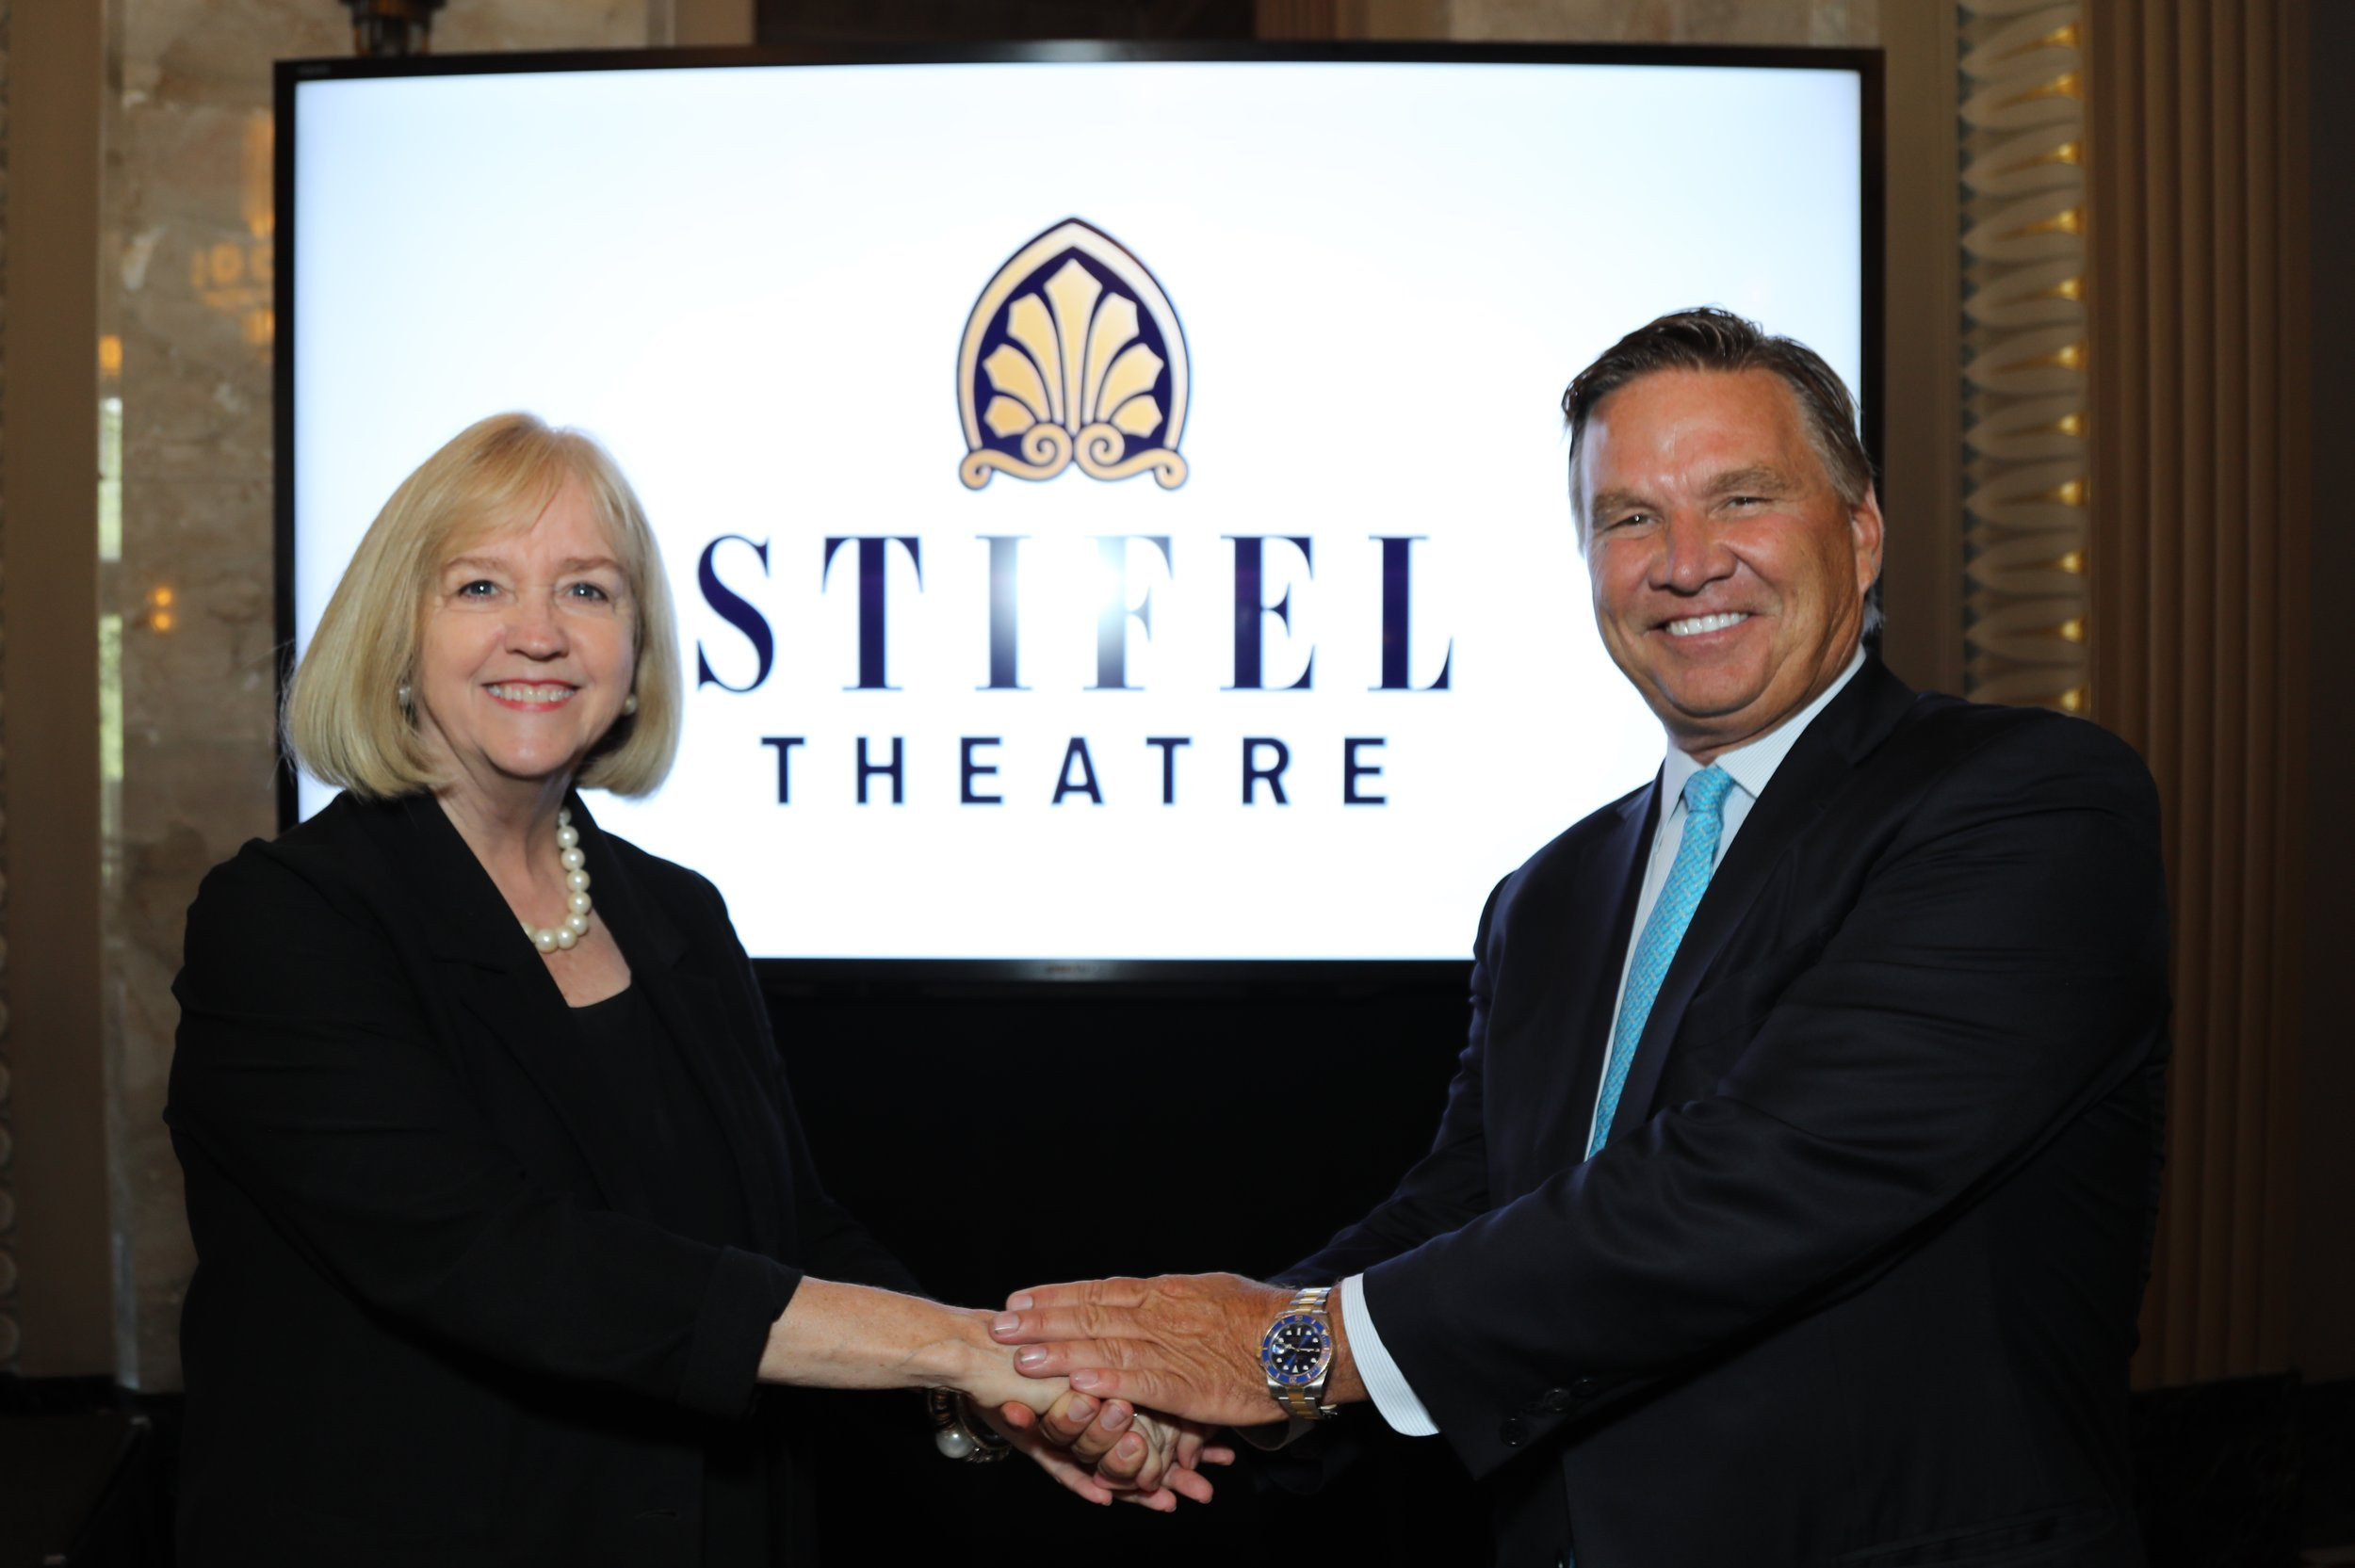 St. Louis Mayor Lyda Krewson with Ron Kruszewski, Chairman and CEO of Stifel Financial Corp. Photo by Diane Anderson